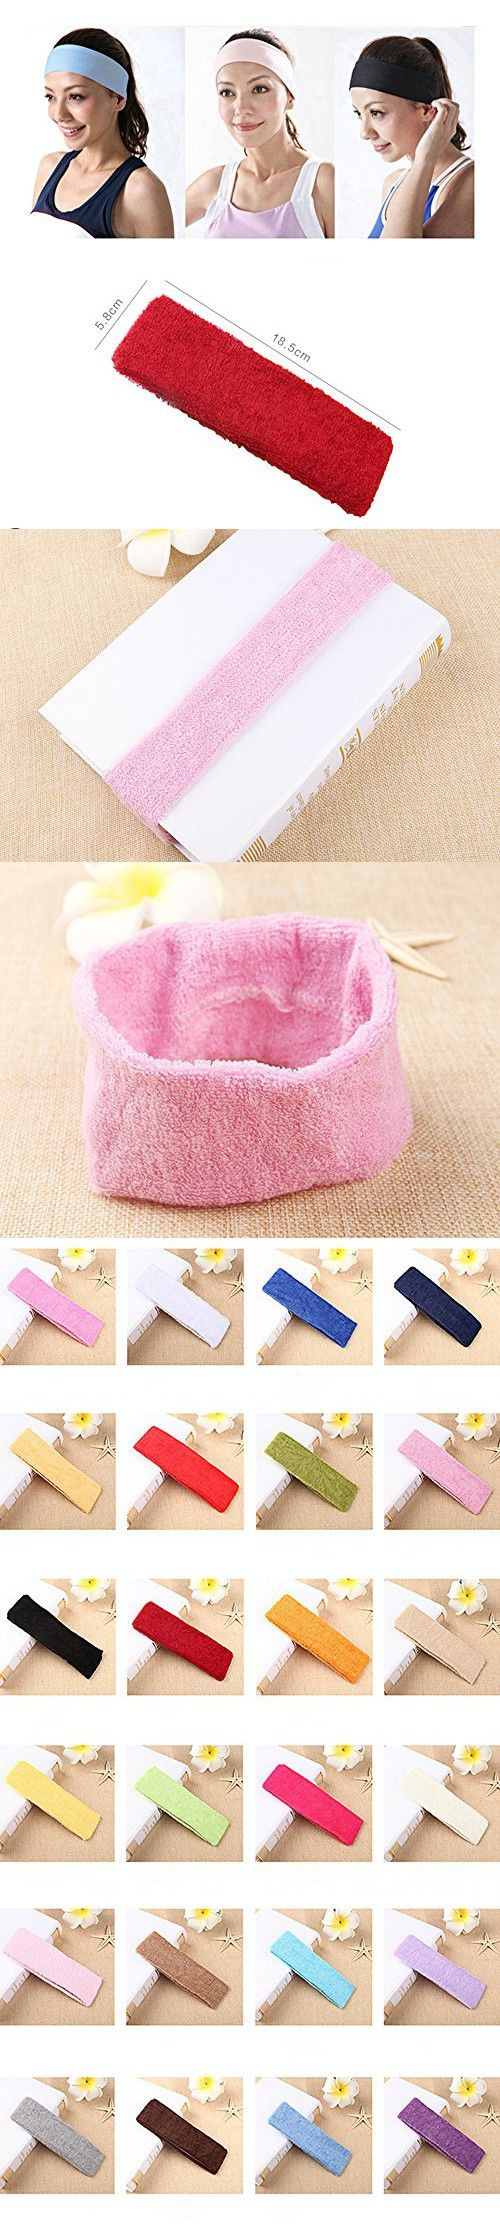 XDOBO Candy Color Hairband Hair Hoop Fitness Yoga Headband Headscarves for Exercise Gym Training Women/ Men